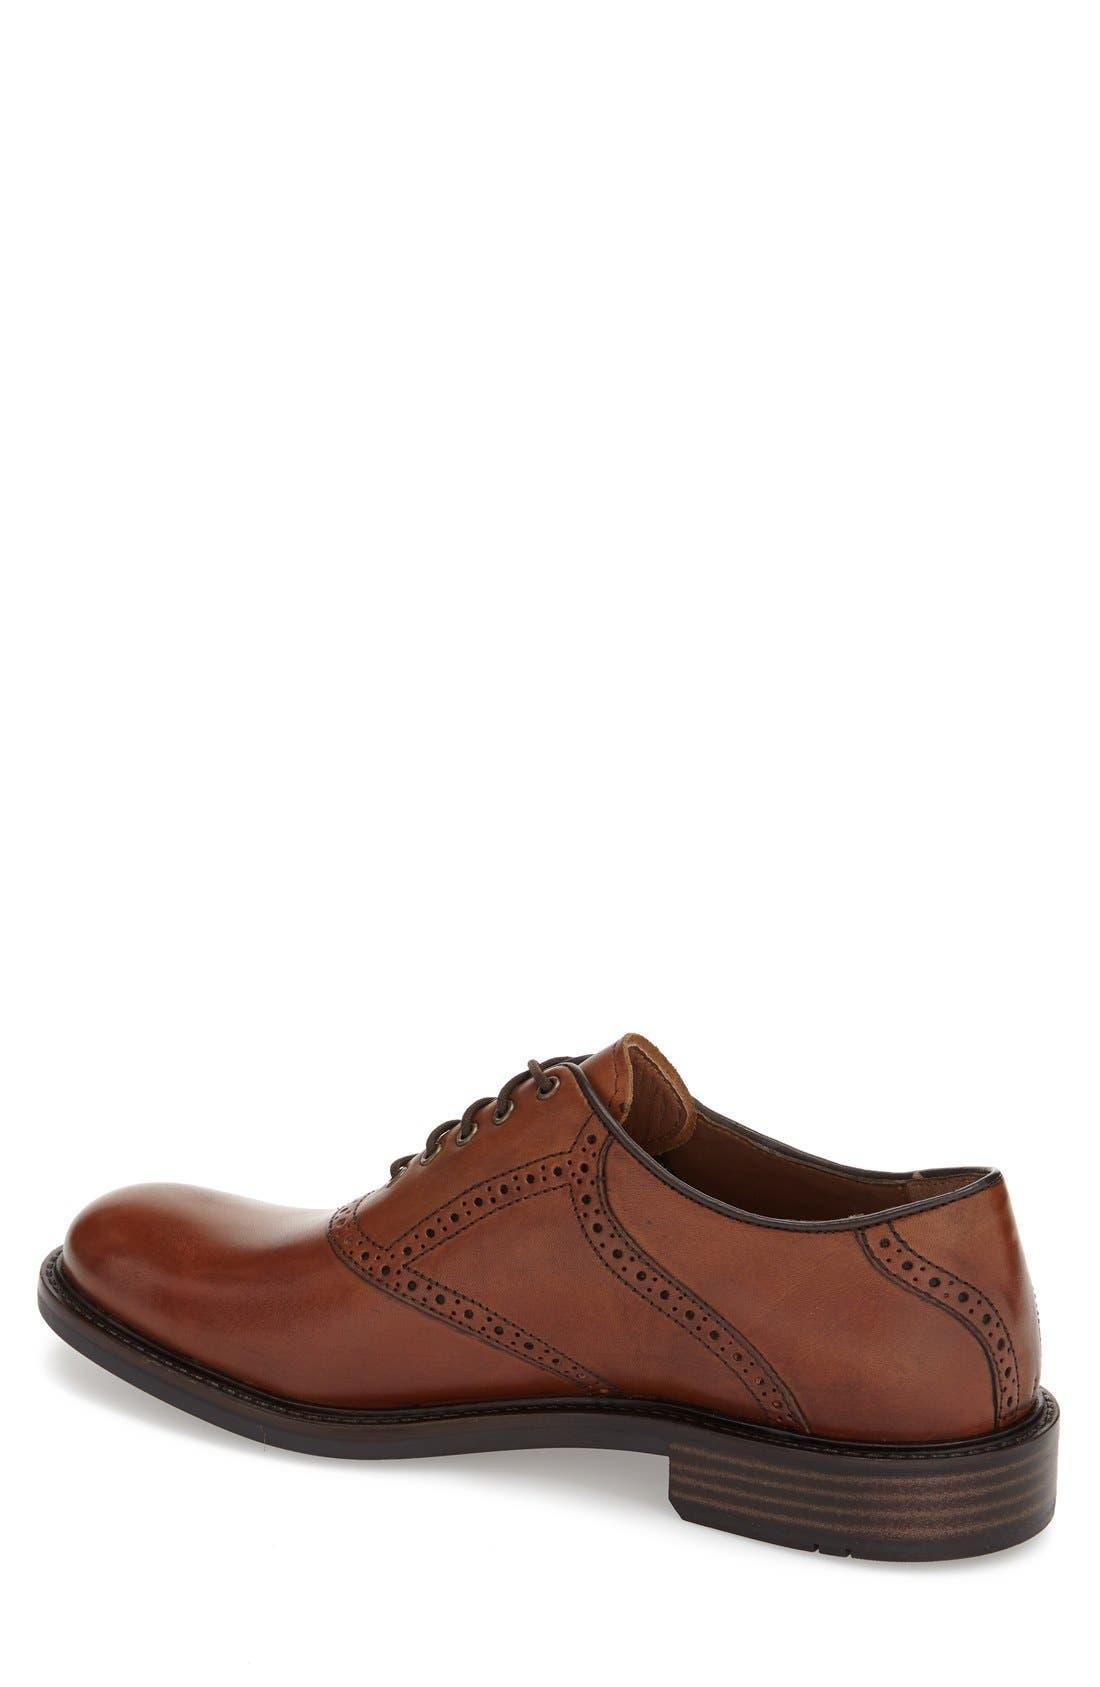 'Tabor' Saddle Shoe,                             Alternate thumbnail 2, color,                             MAHOGANY